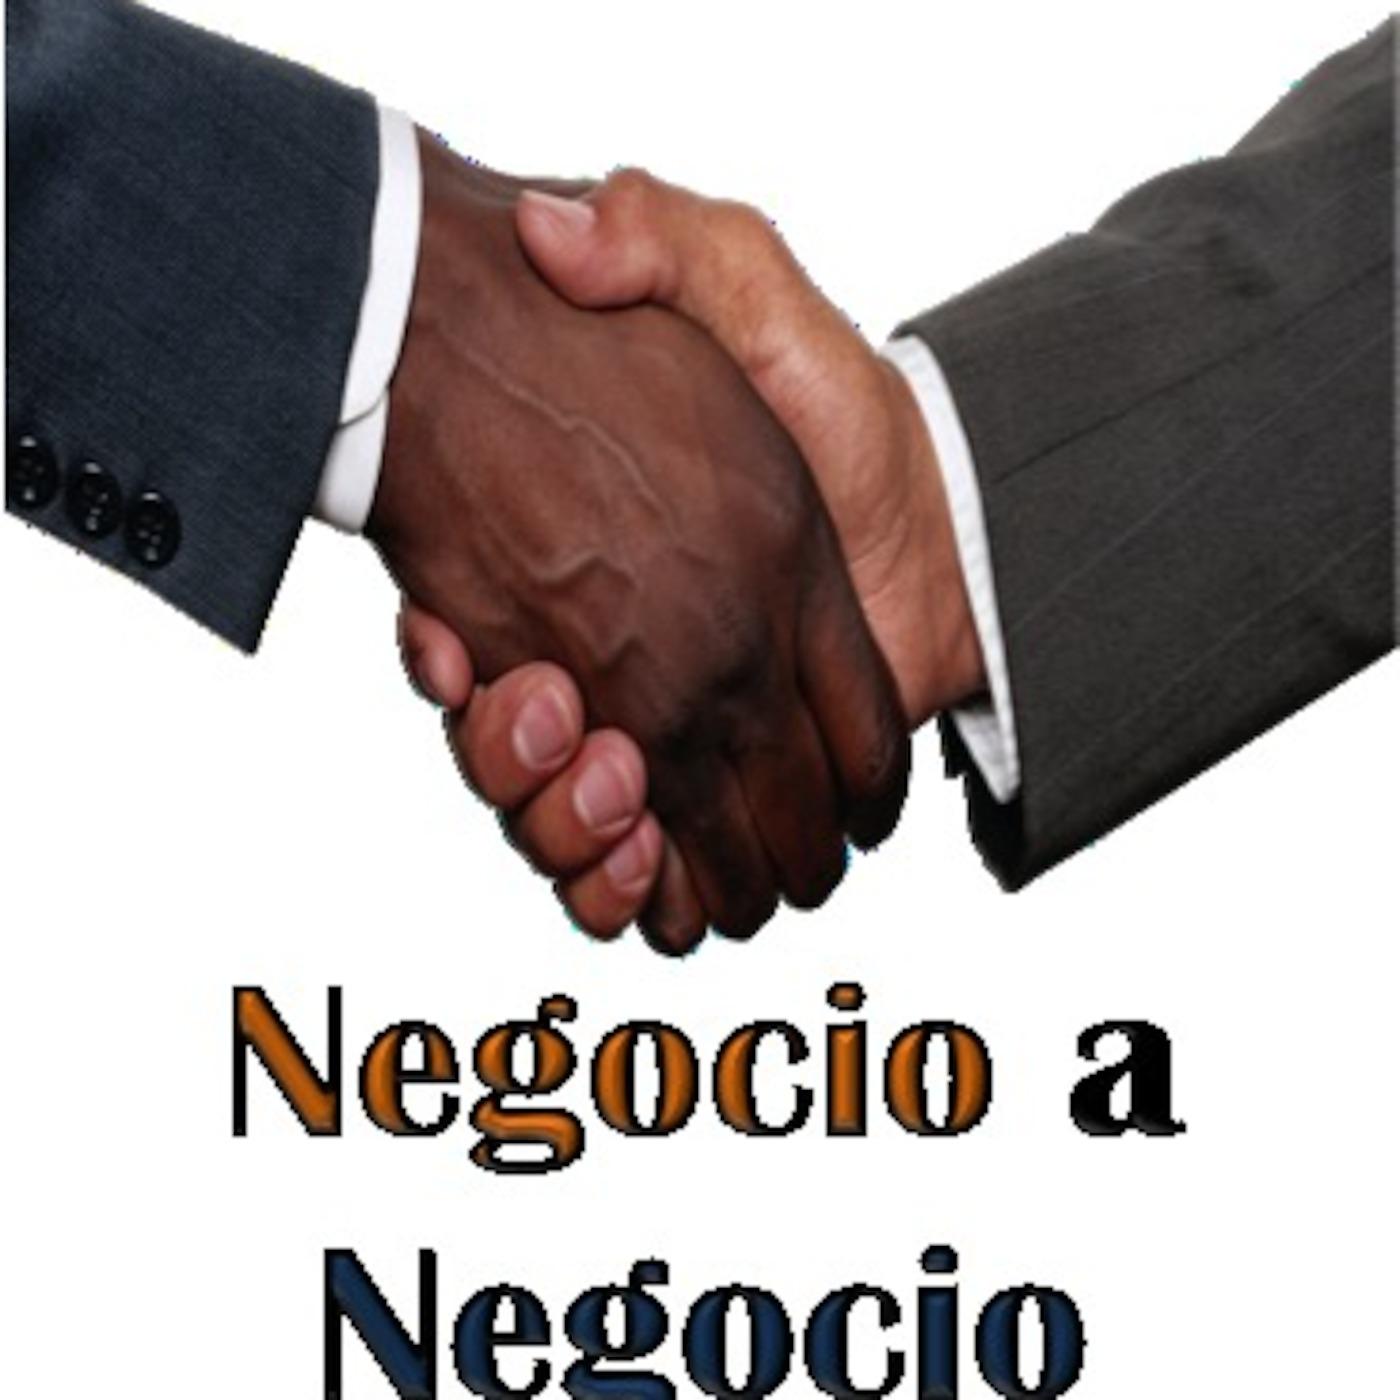 Negocio a Negocio